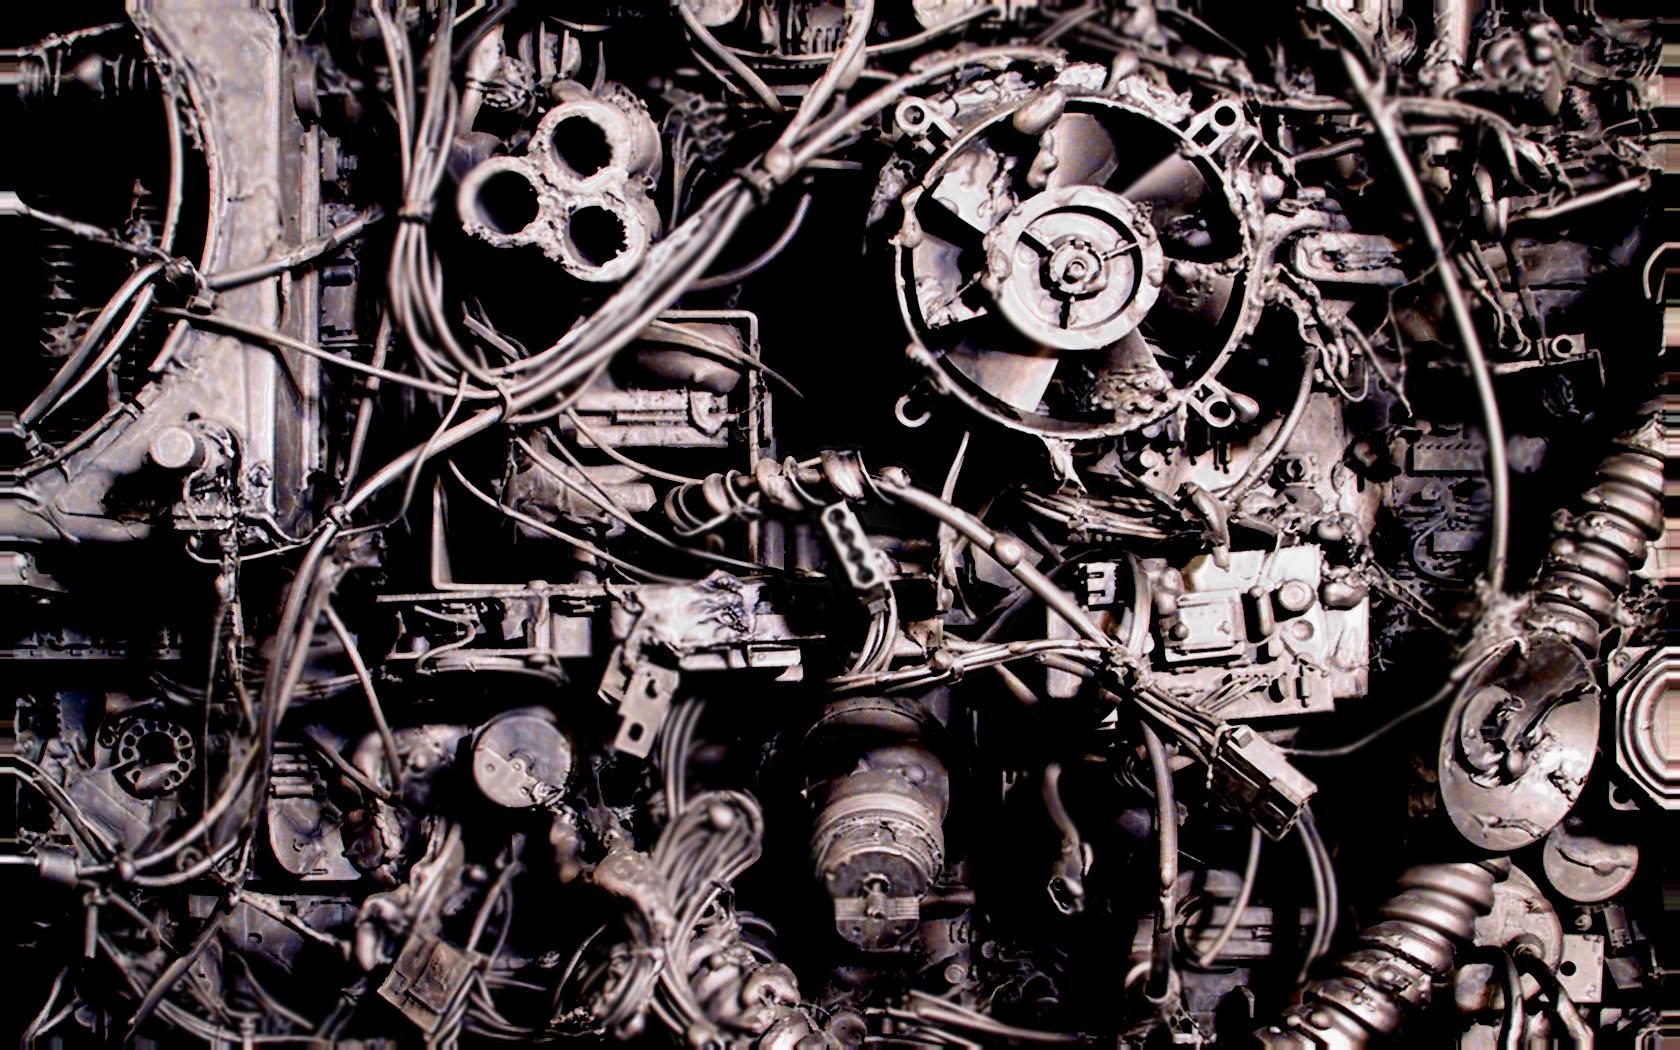 Download Engine Machinery Wallpaper 1680x1050 Wallpoper 1680x1050